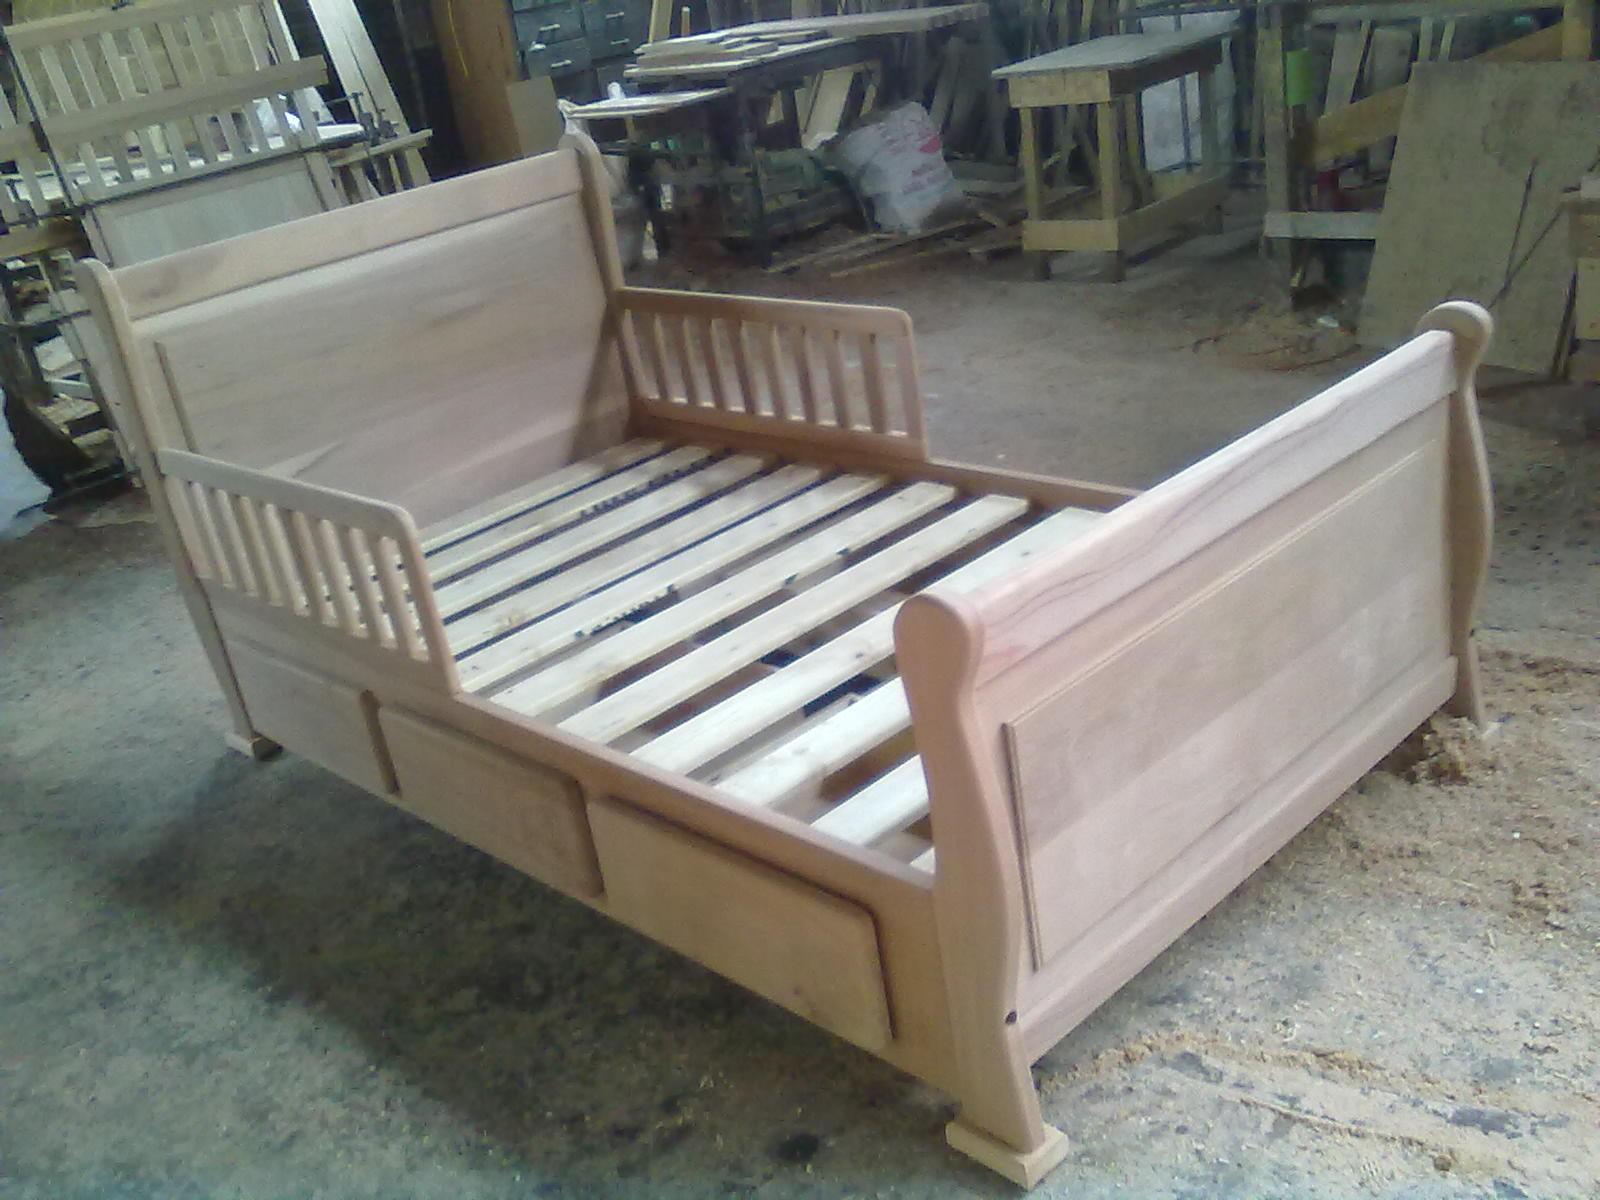 Muebles kotue camas con barandas de transici n for Cama transicion